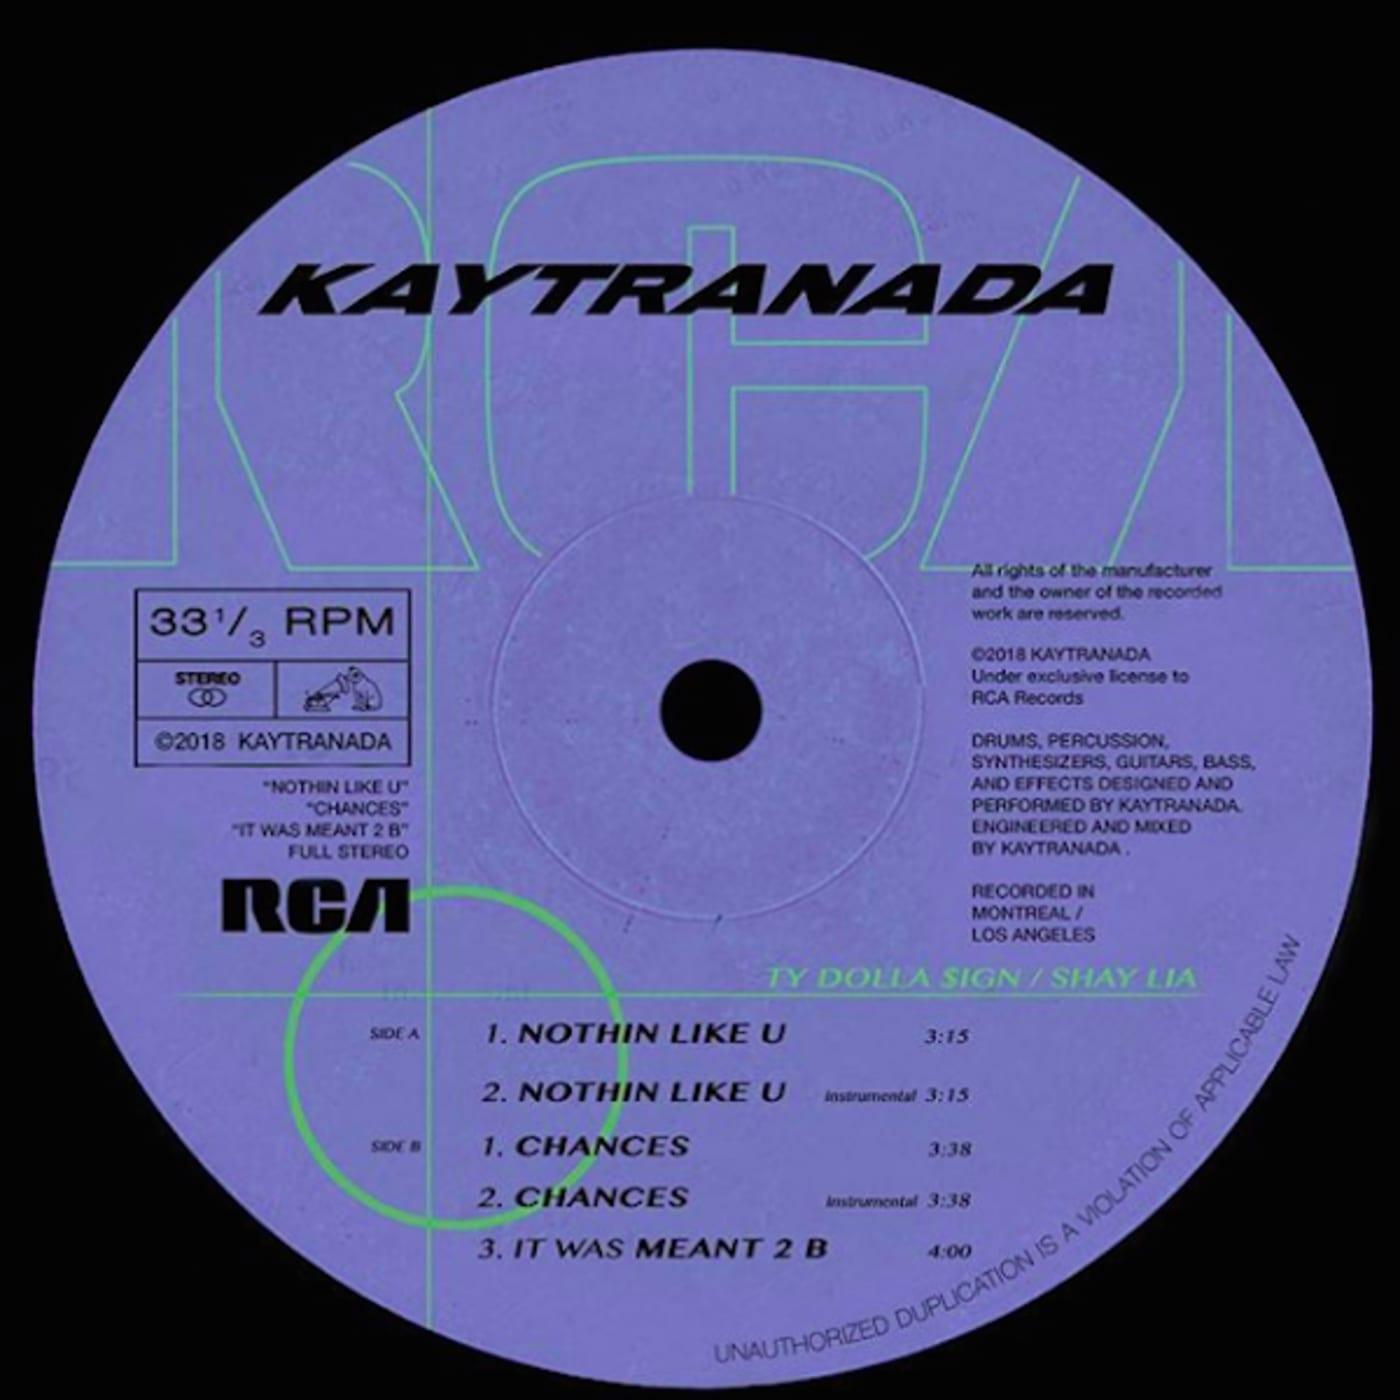 Kaytranada 'Nothin Like U / Chances'